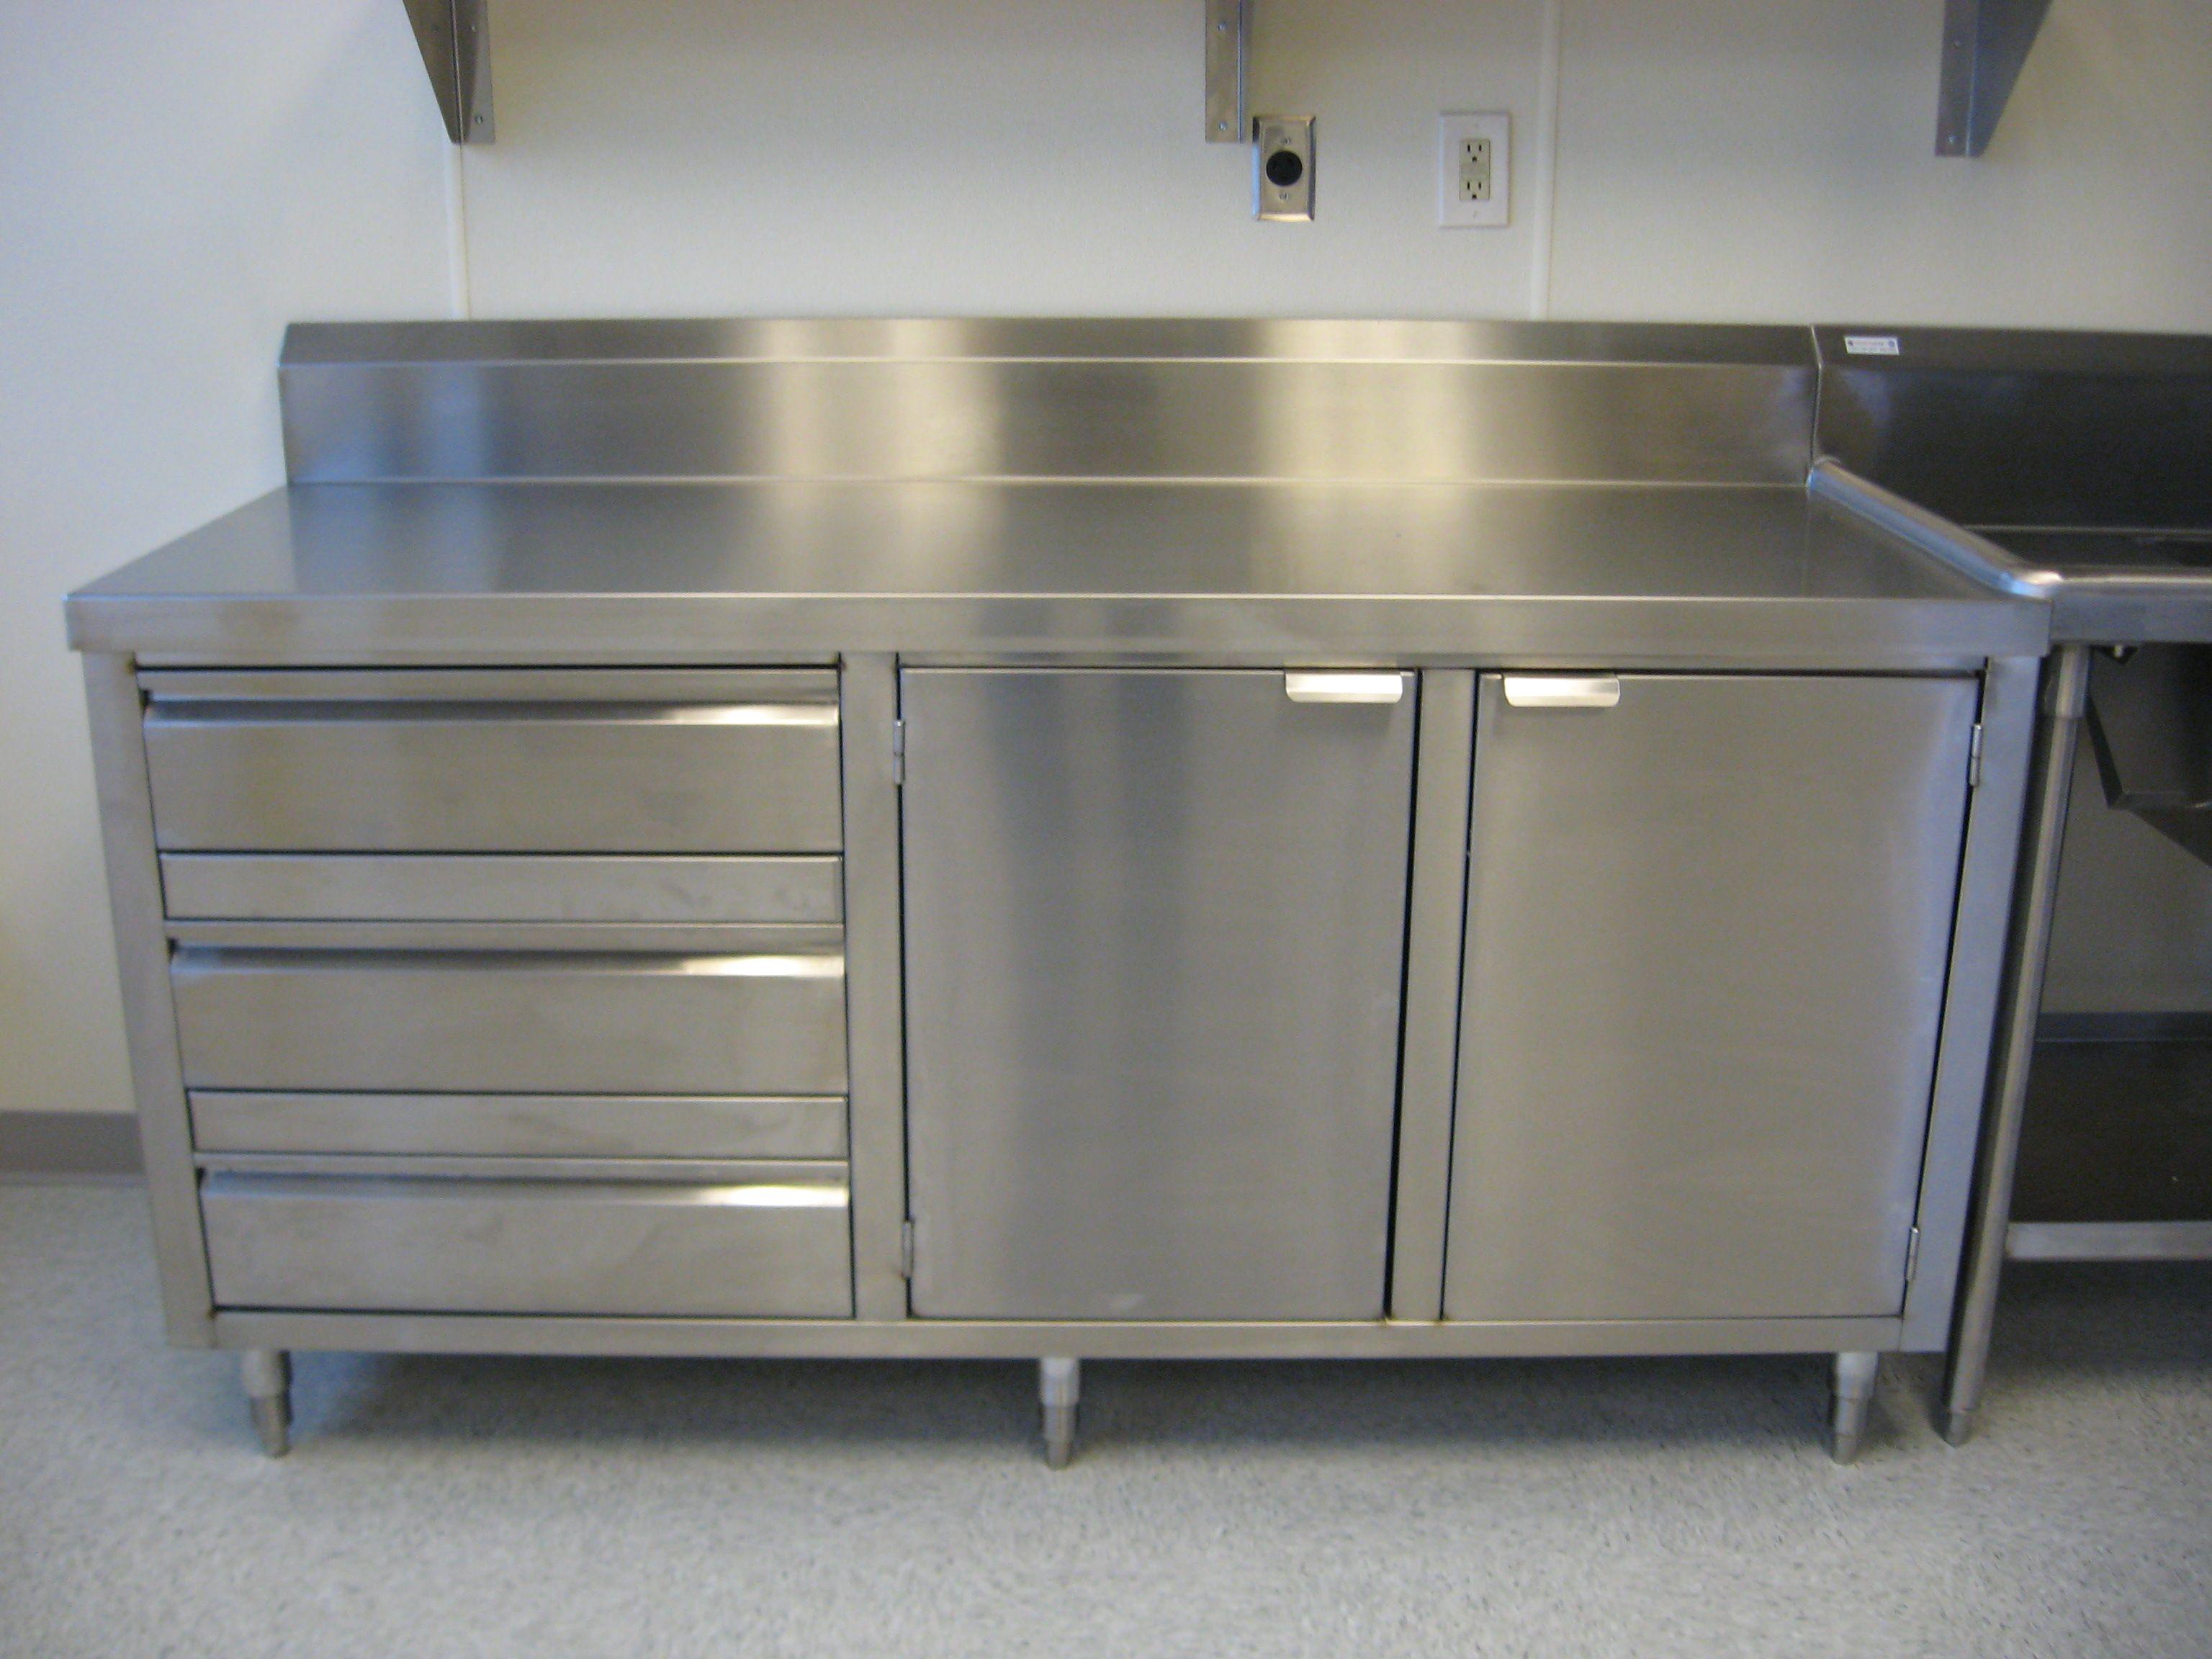 Best Kitchen Gallery: Custom Dish Cabi Michael Kitchen Love Pinterest Metal of Stainless Steel Commercial Kitchen Cabinets on rachelxblog.com